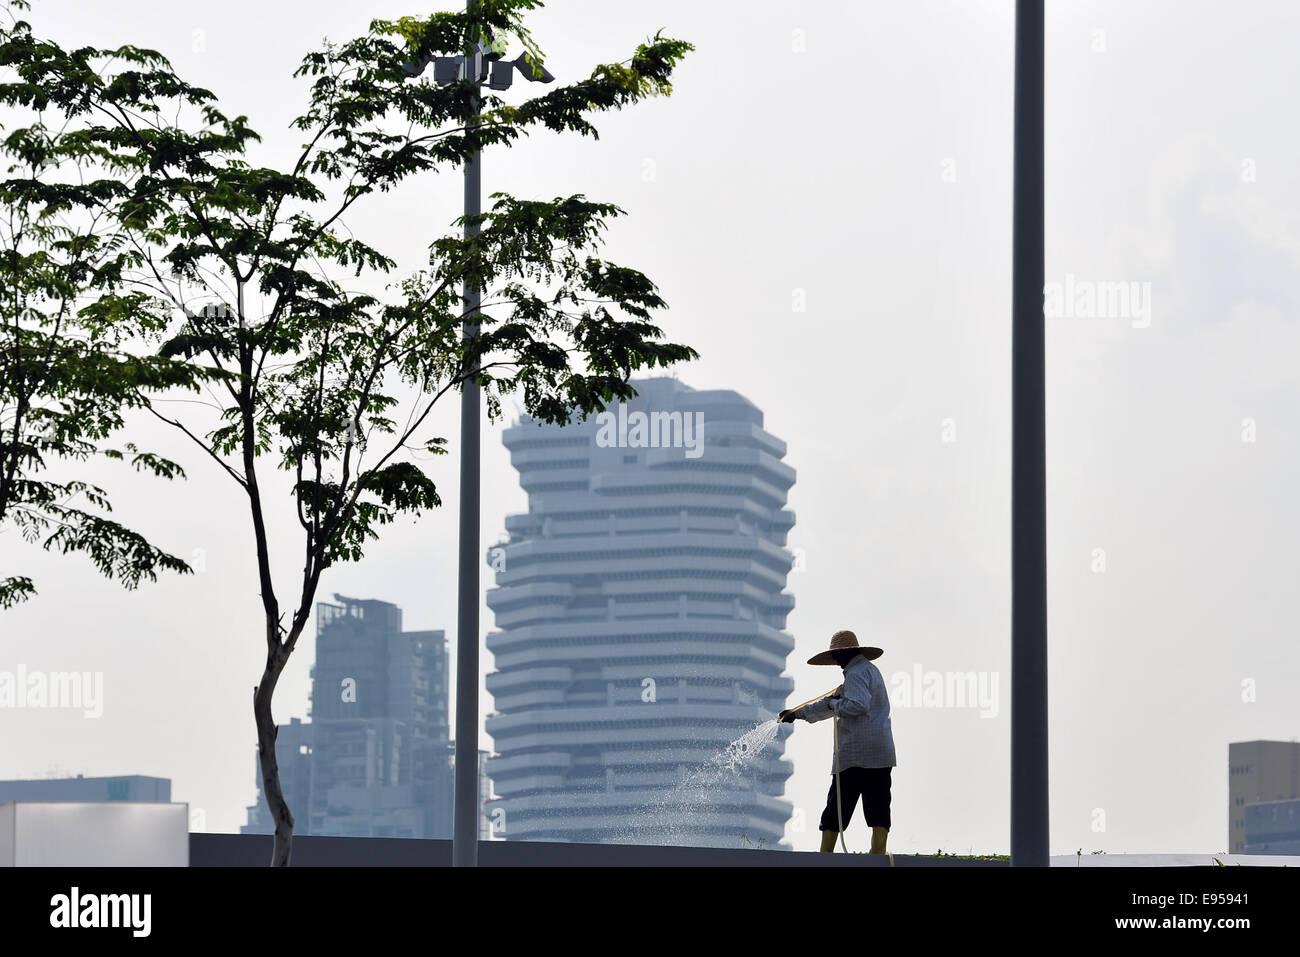 Singapore. 20th Oct, 2014. A gardener works in haze in Singapore, Oct. 20, 2014. Singapore's 3-hour Pollution - Stock Image